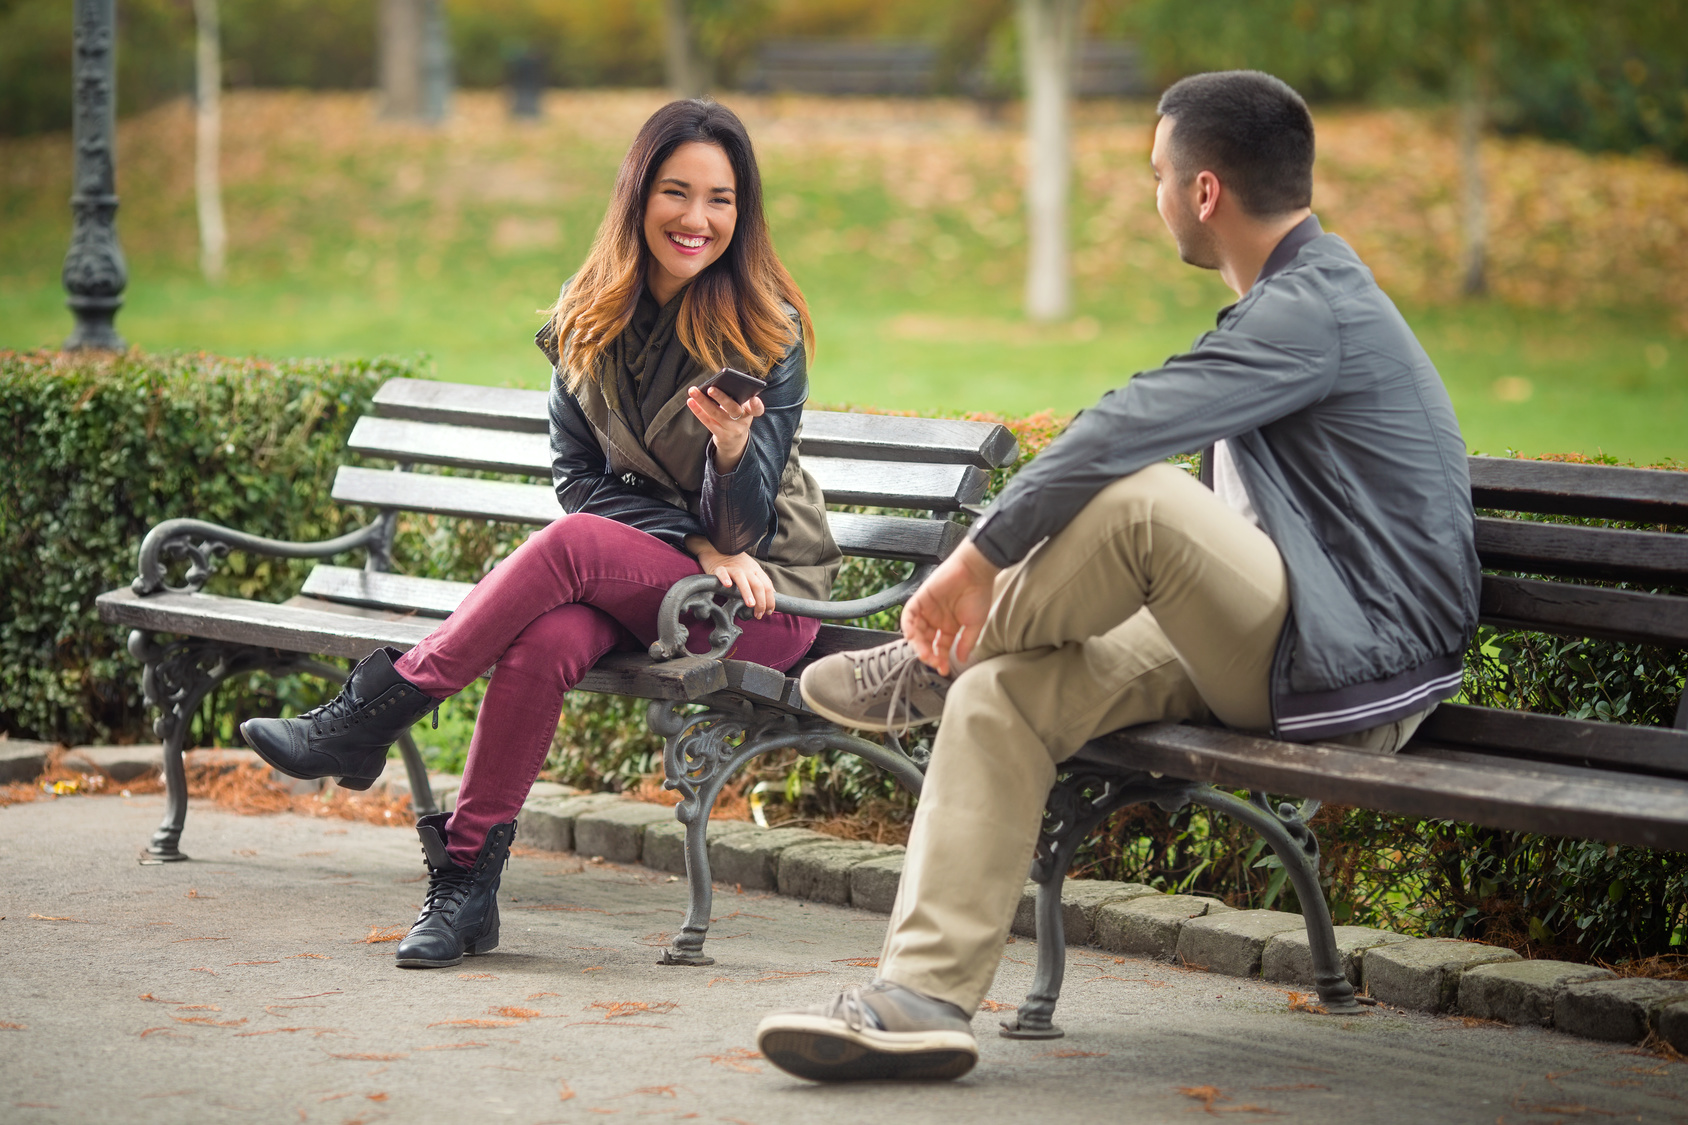 Dating sites to meet rich guys wolverhampton